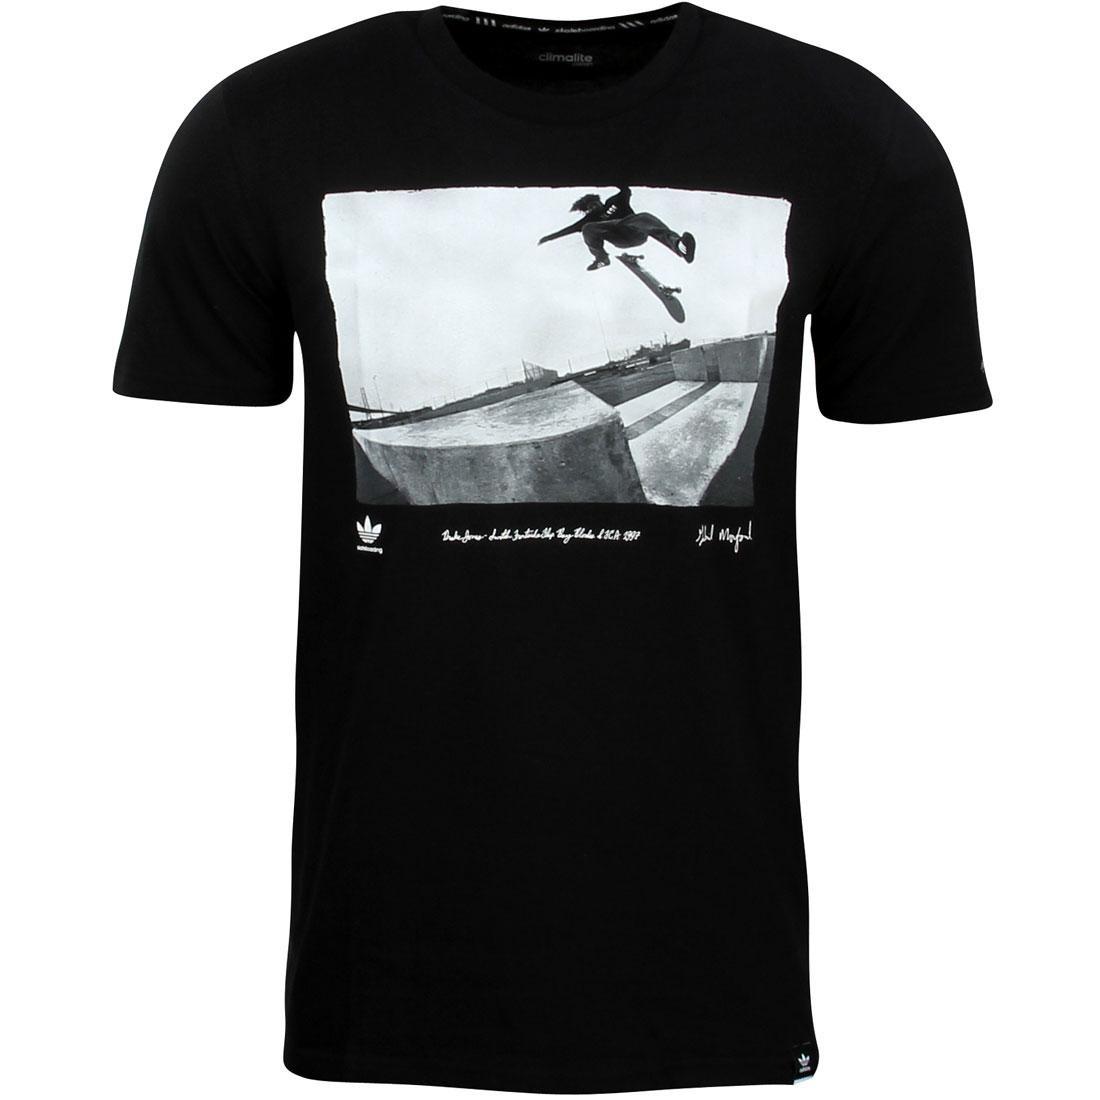 Adidas Skate Men Respect Your Roots Tee - Drake Jones (black)